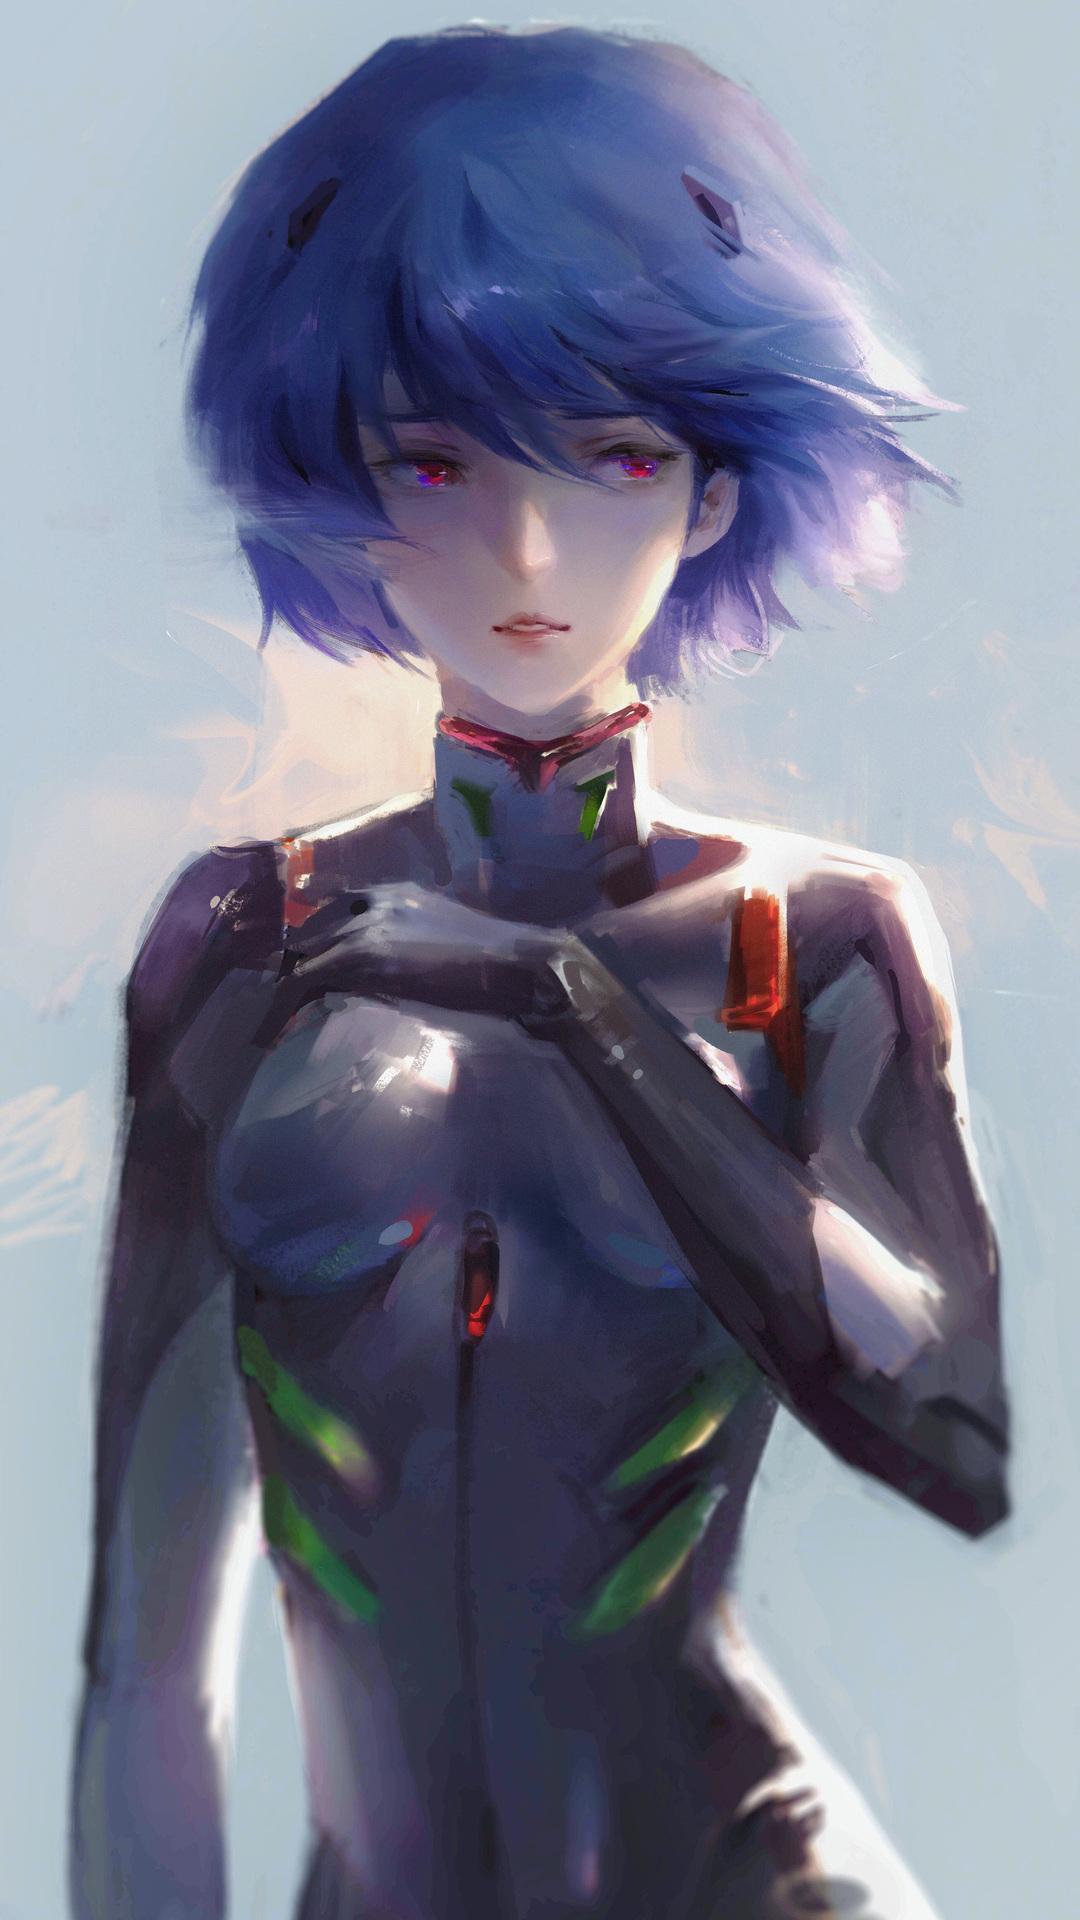 1080x1920 Neon Genesis Evangelion Dcchris Artwork Iphone 7 ...